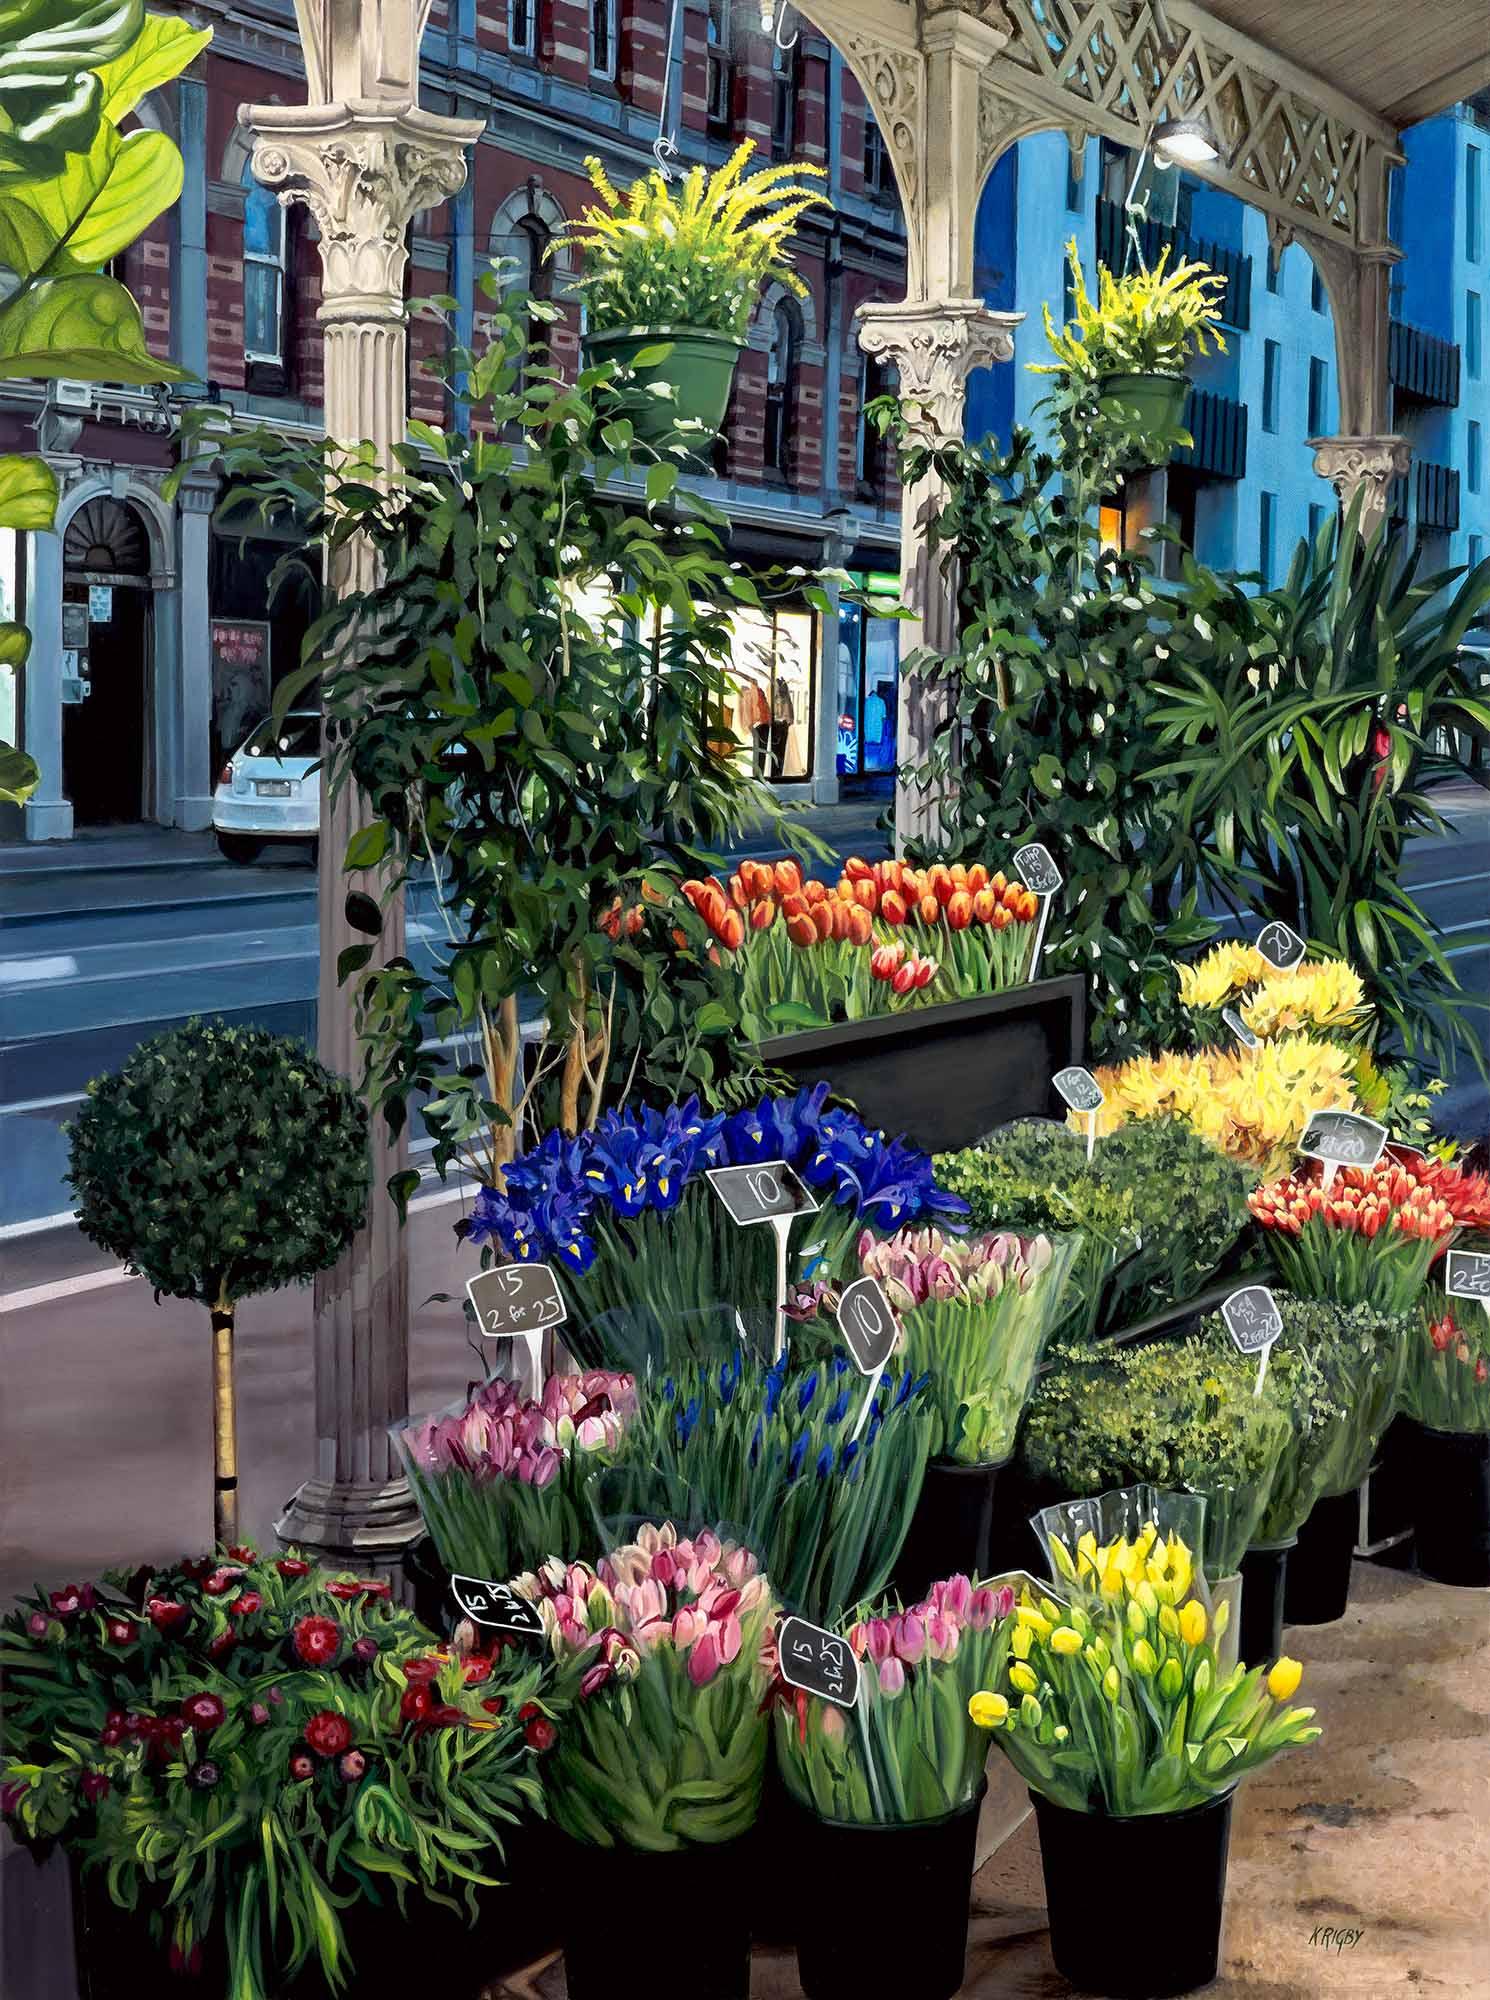 K rigby 047 the night florist 2000px yf258a